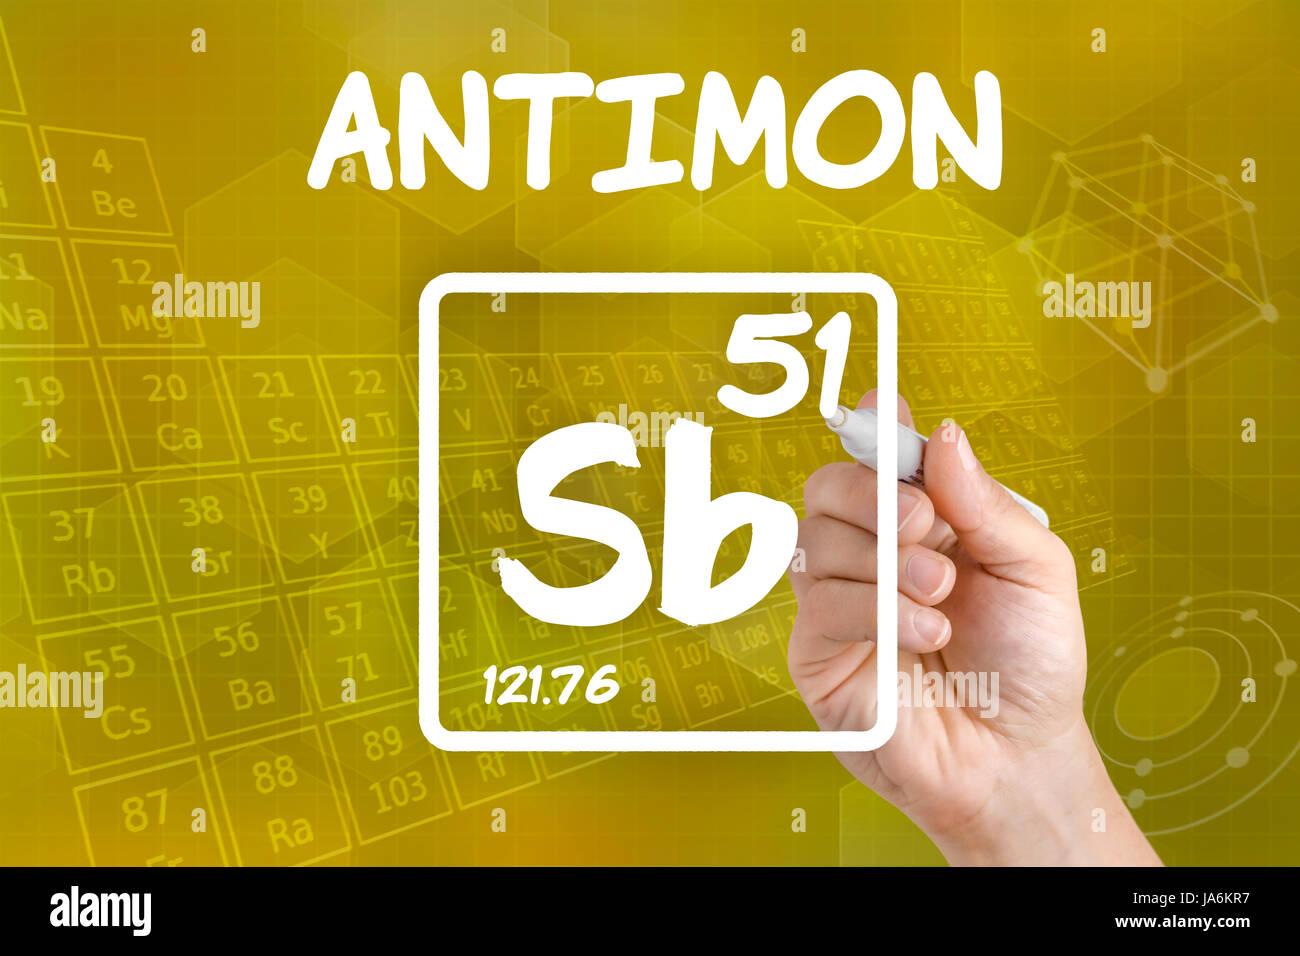 Symbol Of The Chemical Element Antimony Stock Photo 143976763 Alamy